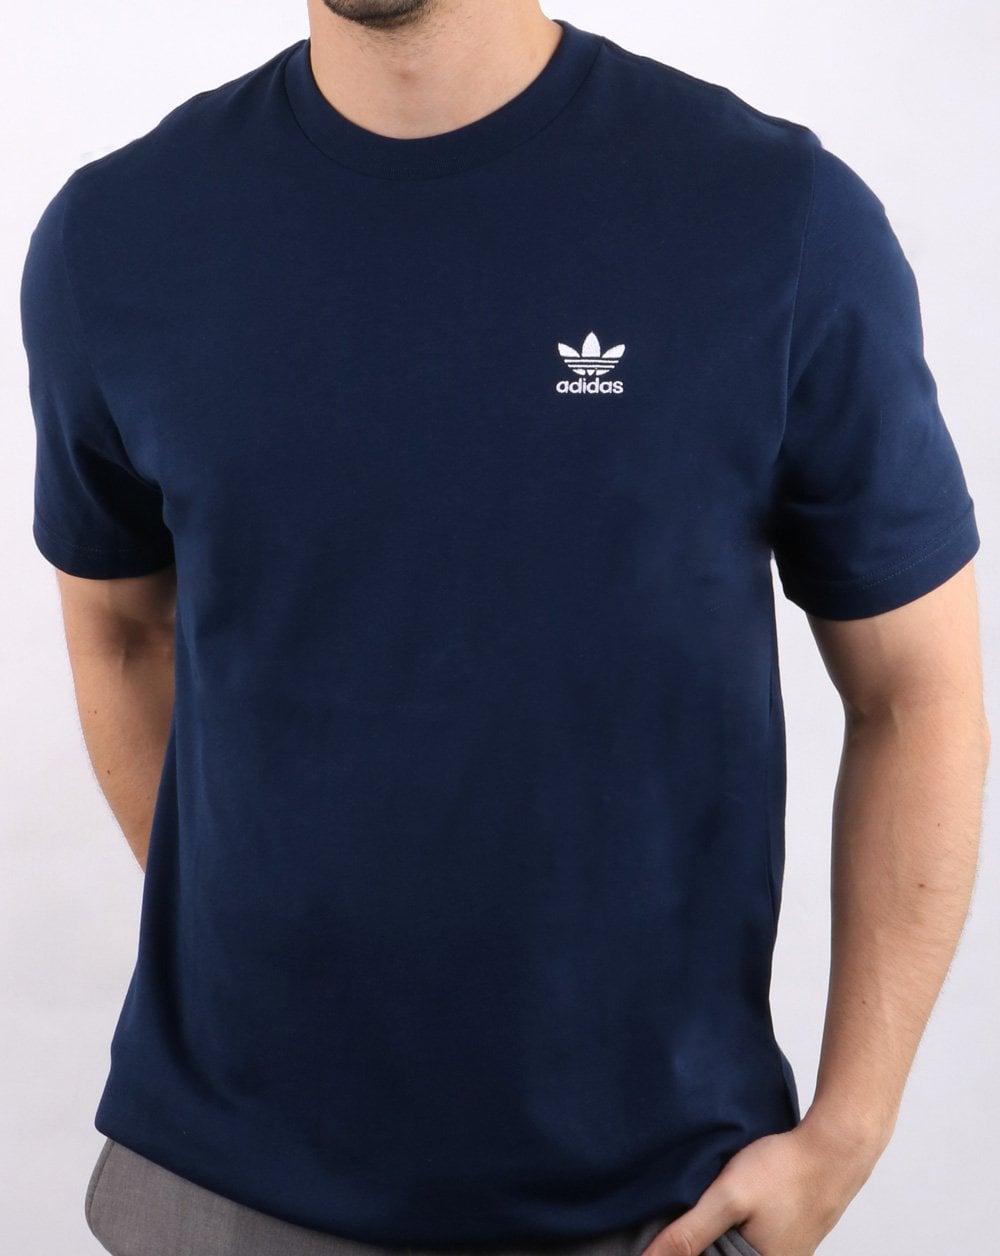 Adidas Originals Ess T Shirt Navy